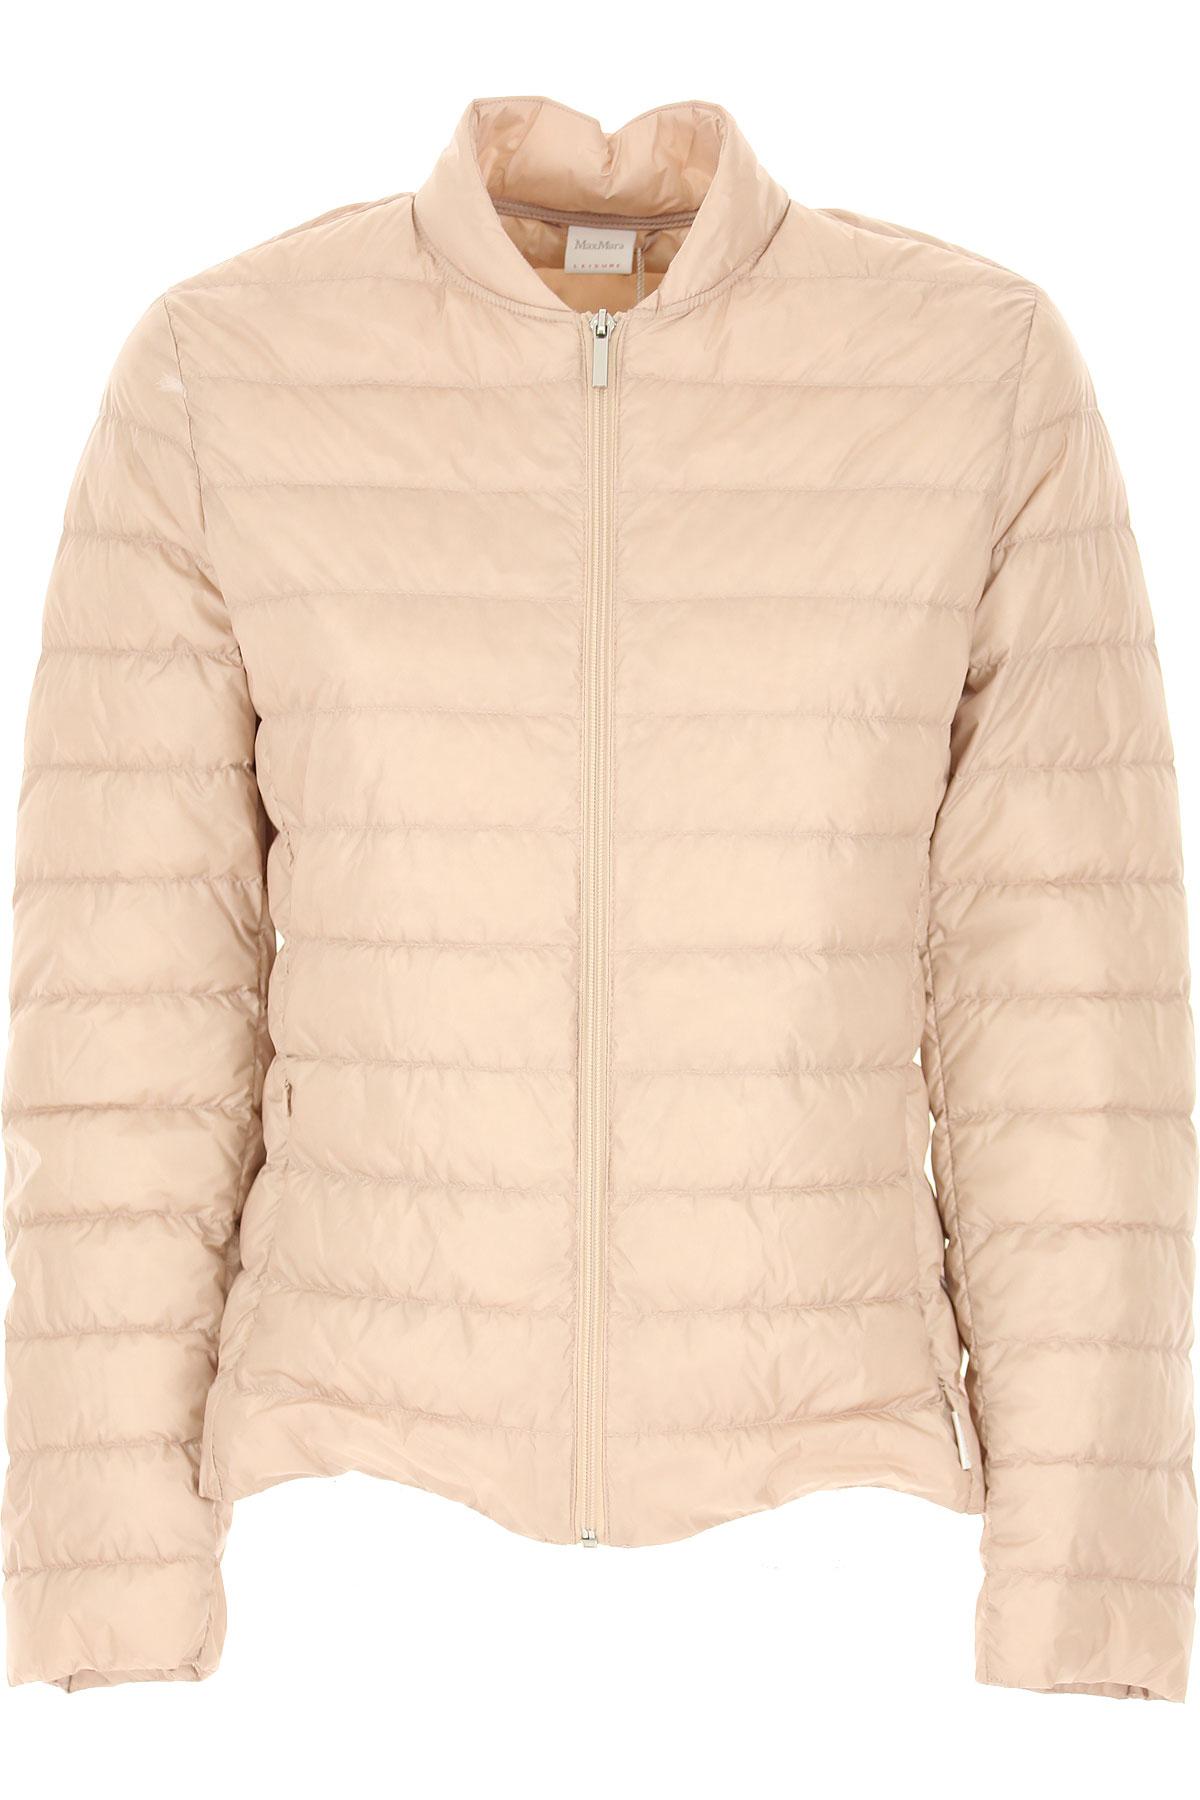 Max Mara Down Jacket for Women, Puffer Ski Jacket On Sale, Dusty, polyamide, 2019, 4 6